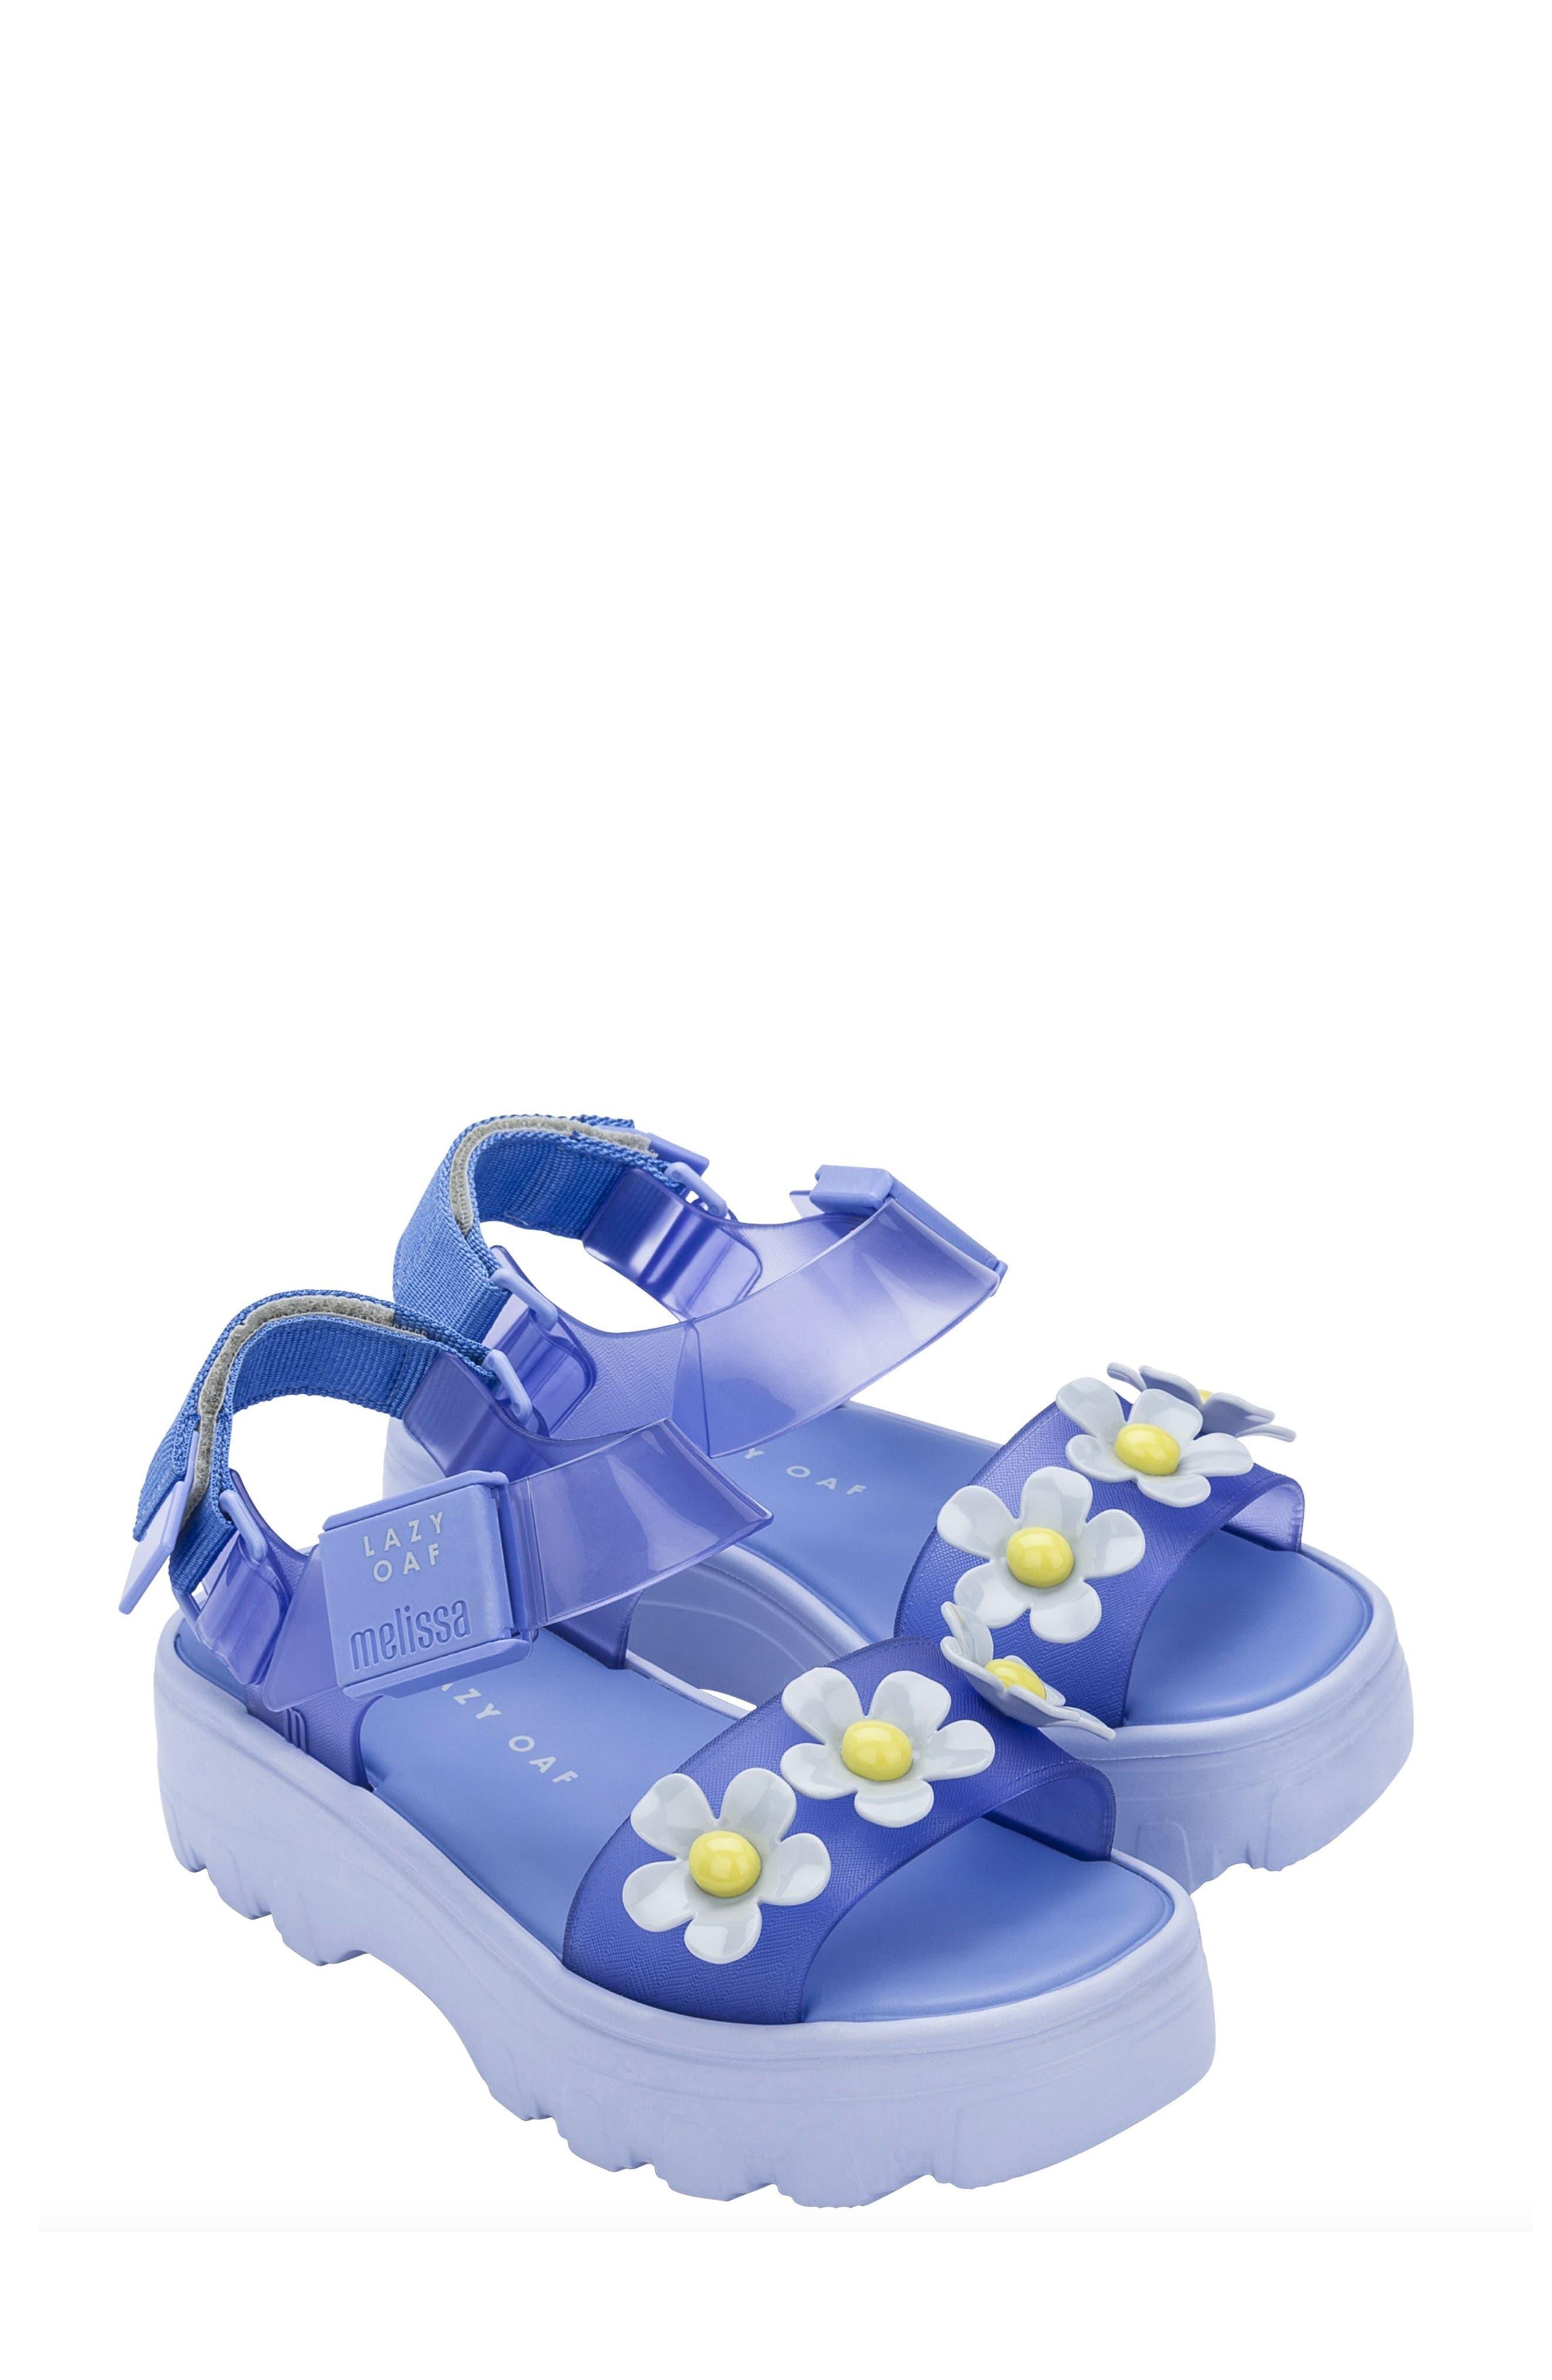 X Lazy Oaf Kick Off Lug Sole Platform Sandal